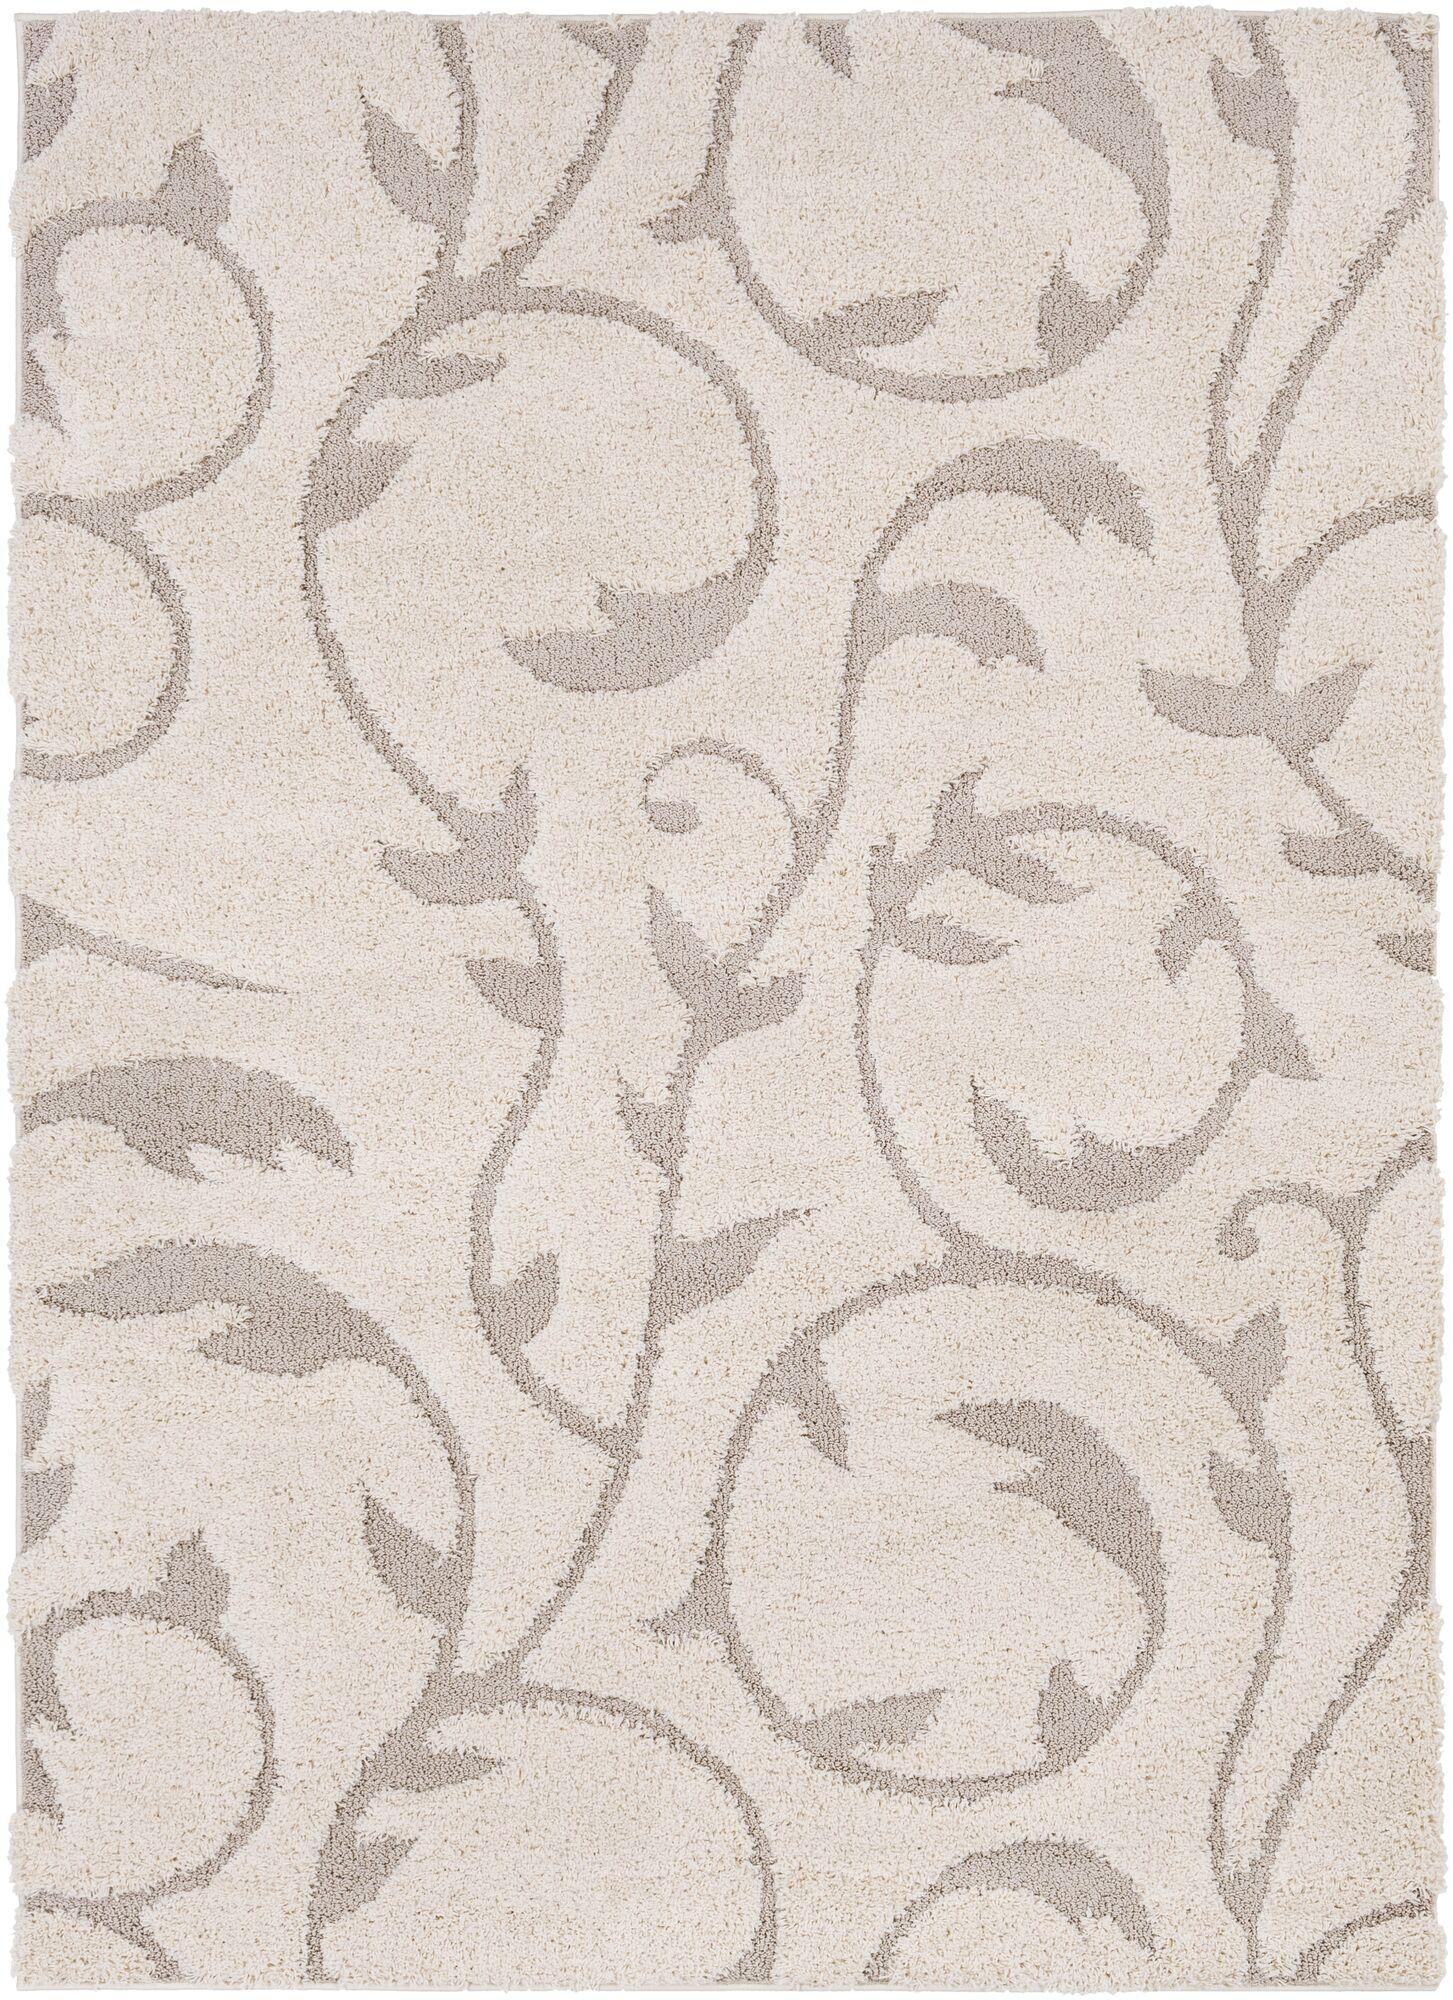 Arlen Floral Cream/Tan Area Rug Rug Size: Rectangle 5'3